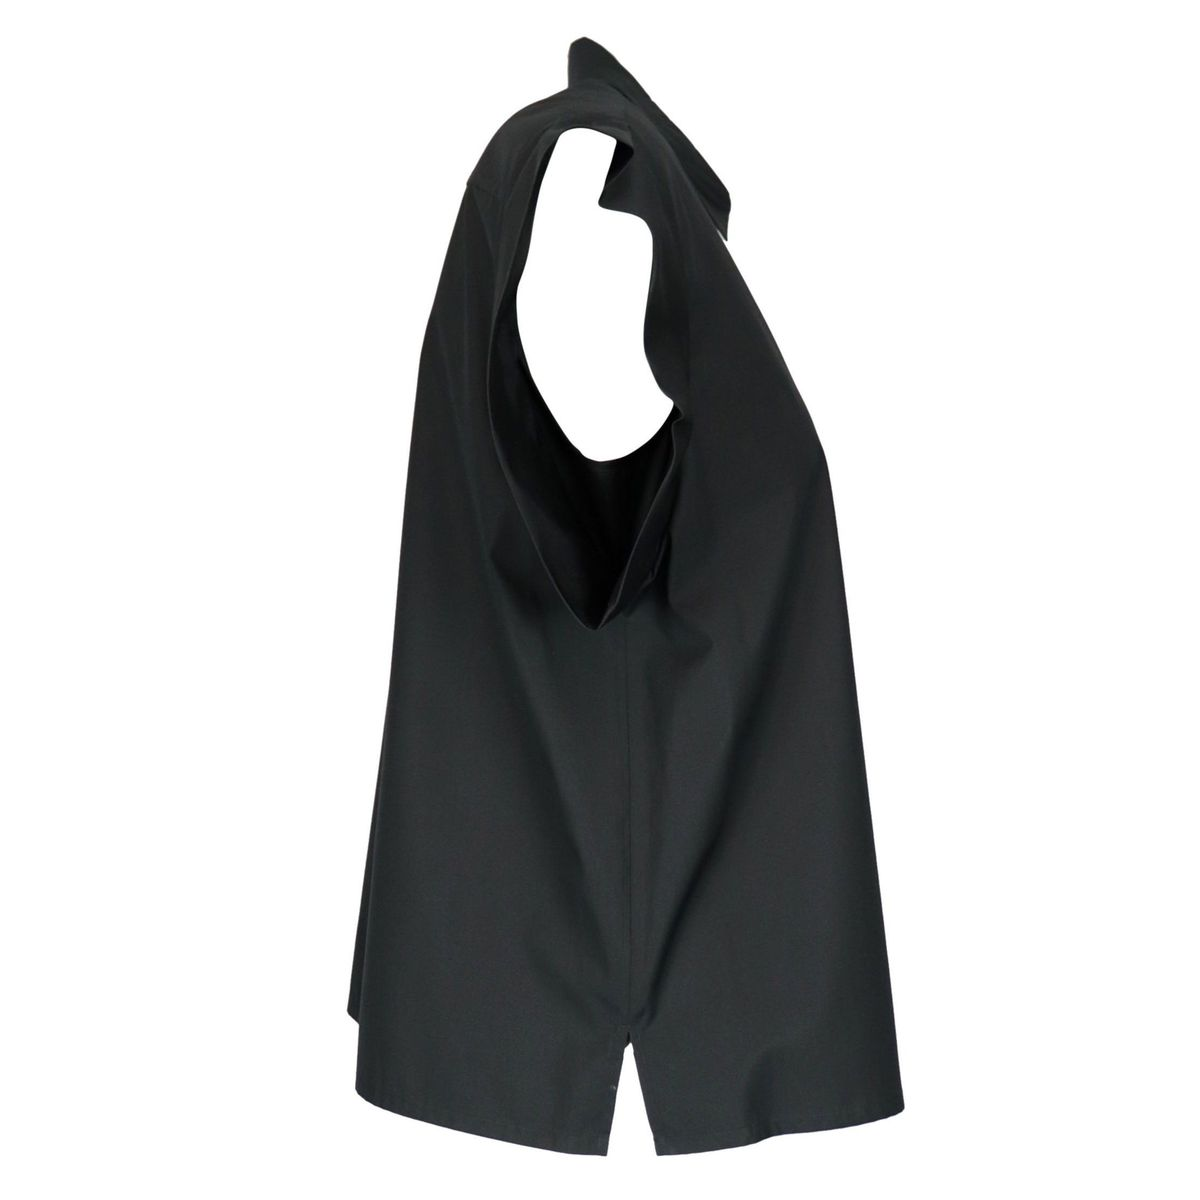 Muscari shirt in cotton with cap sleeves Black MAX MARA STUDIO